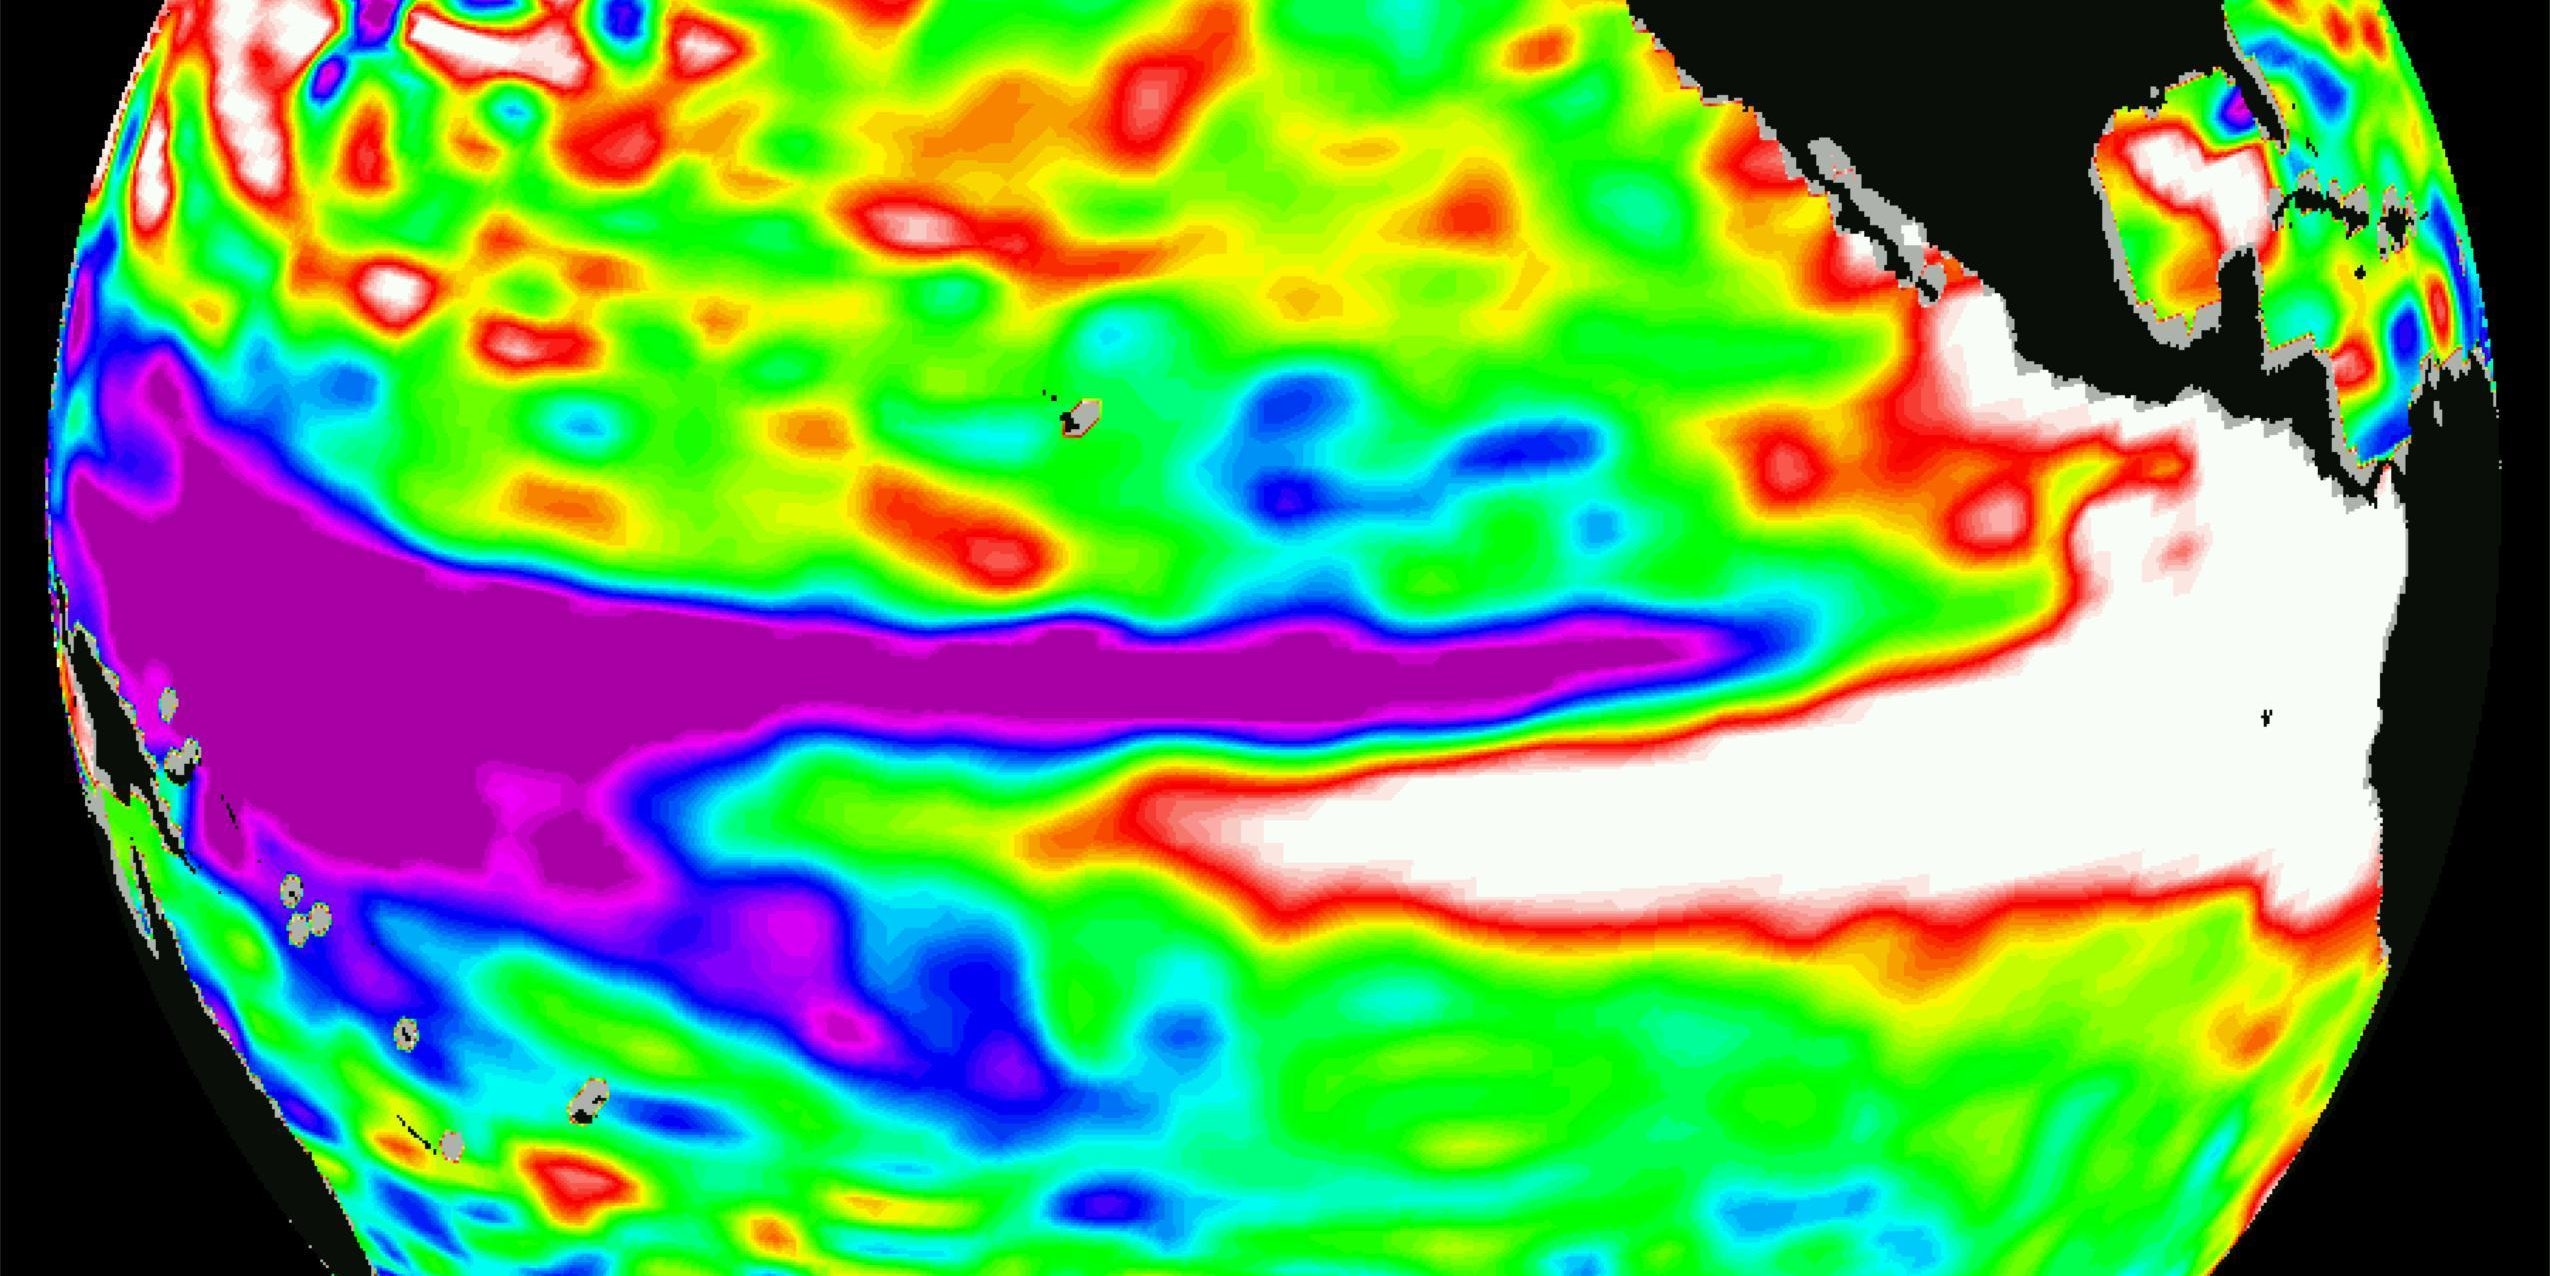 The 1997 El Niño seen by TOPEX/Poseidon